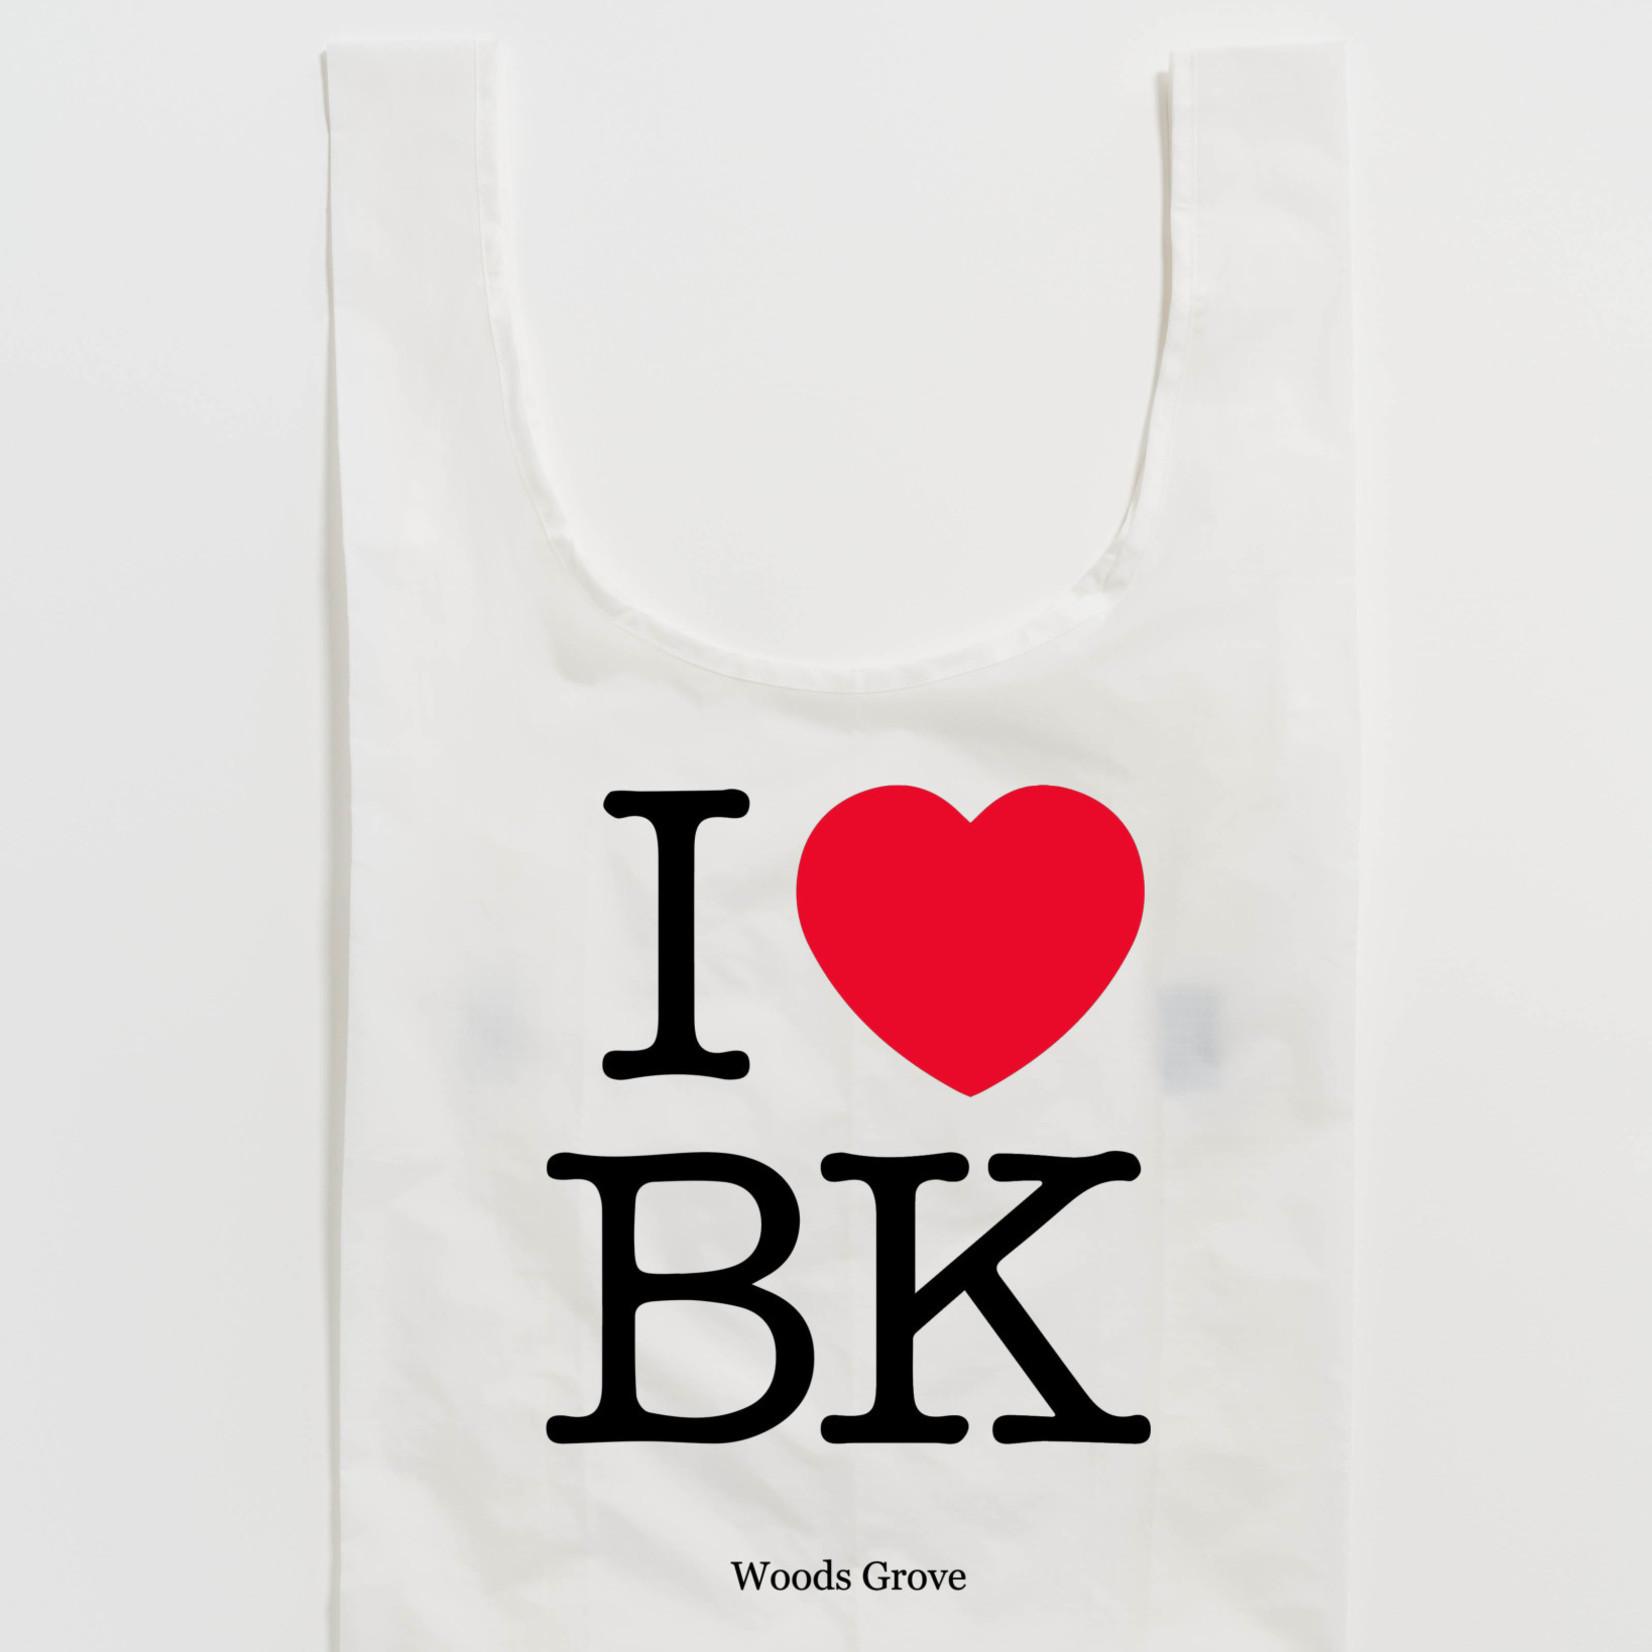 Woods Grove Woods Grove x Baggu Reusable Bag Standard - I Love BK White